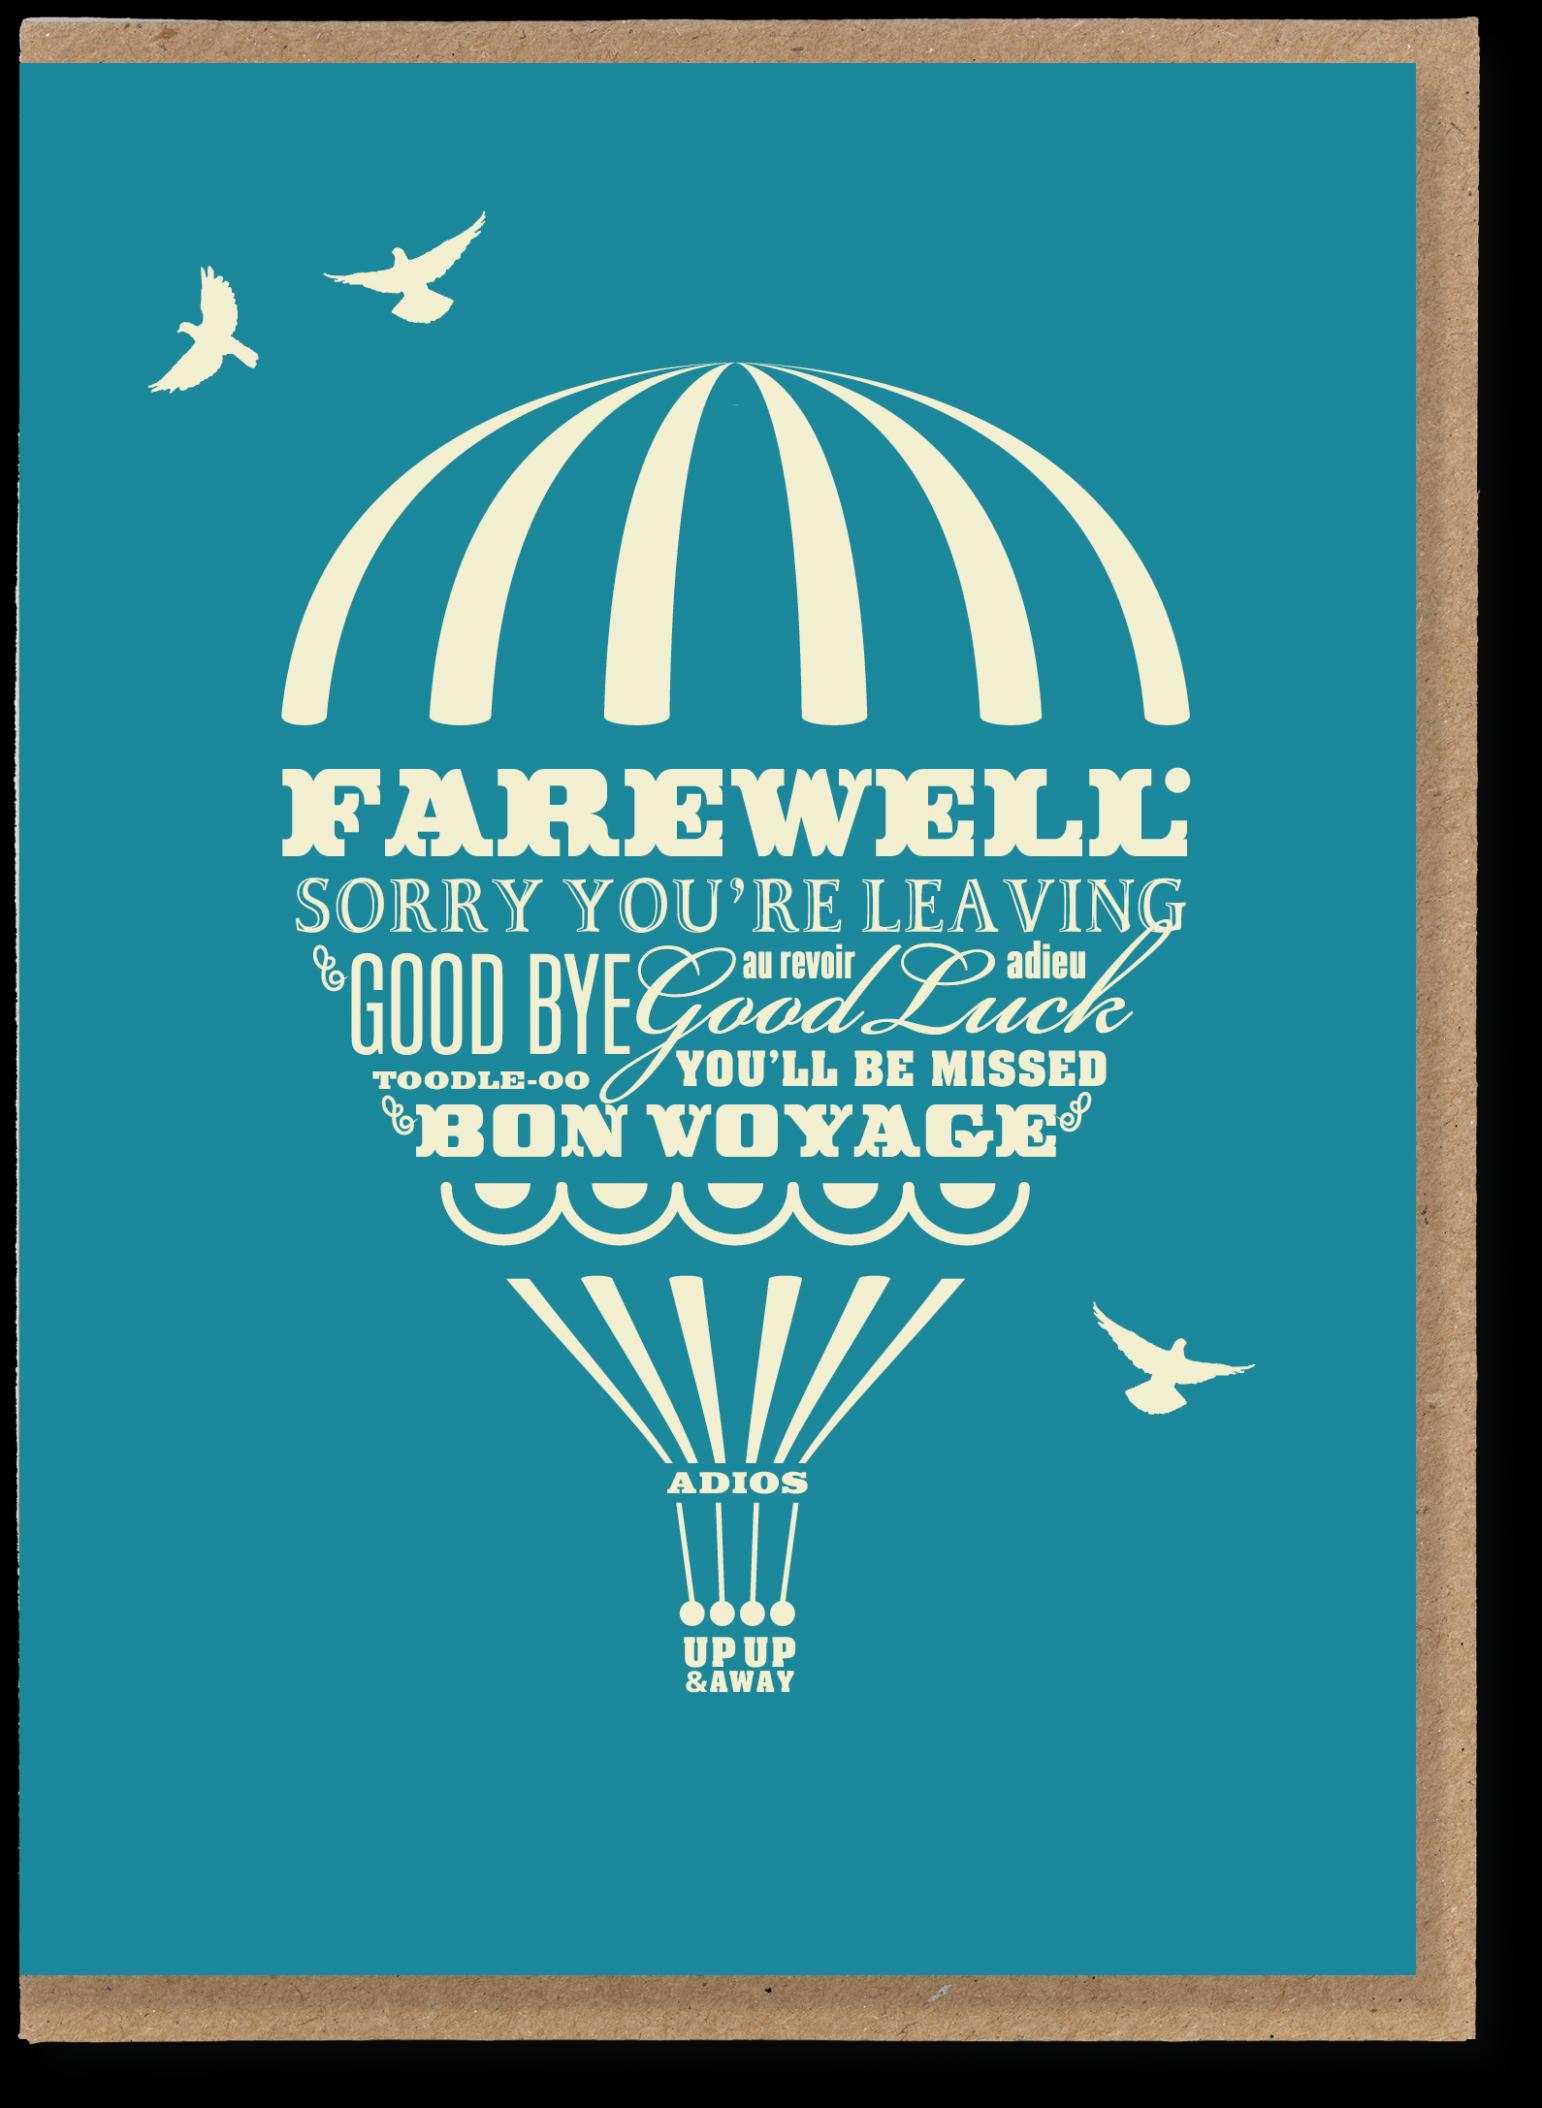 farewell card template microsoft word  Farewell balloon - JMT 20 - Greetings cards and art prints ..